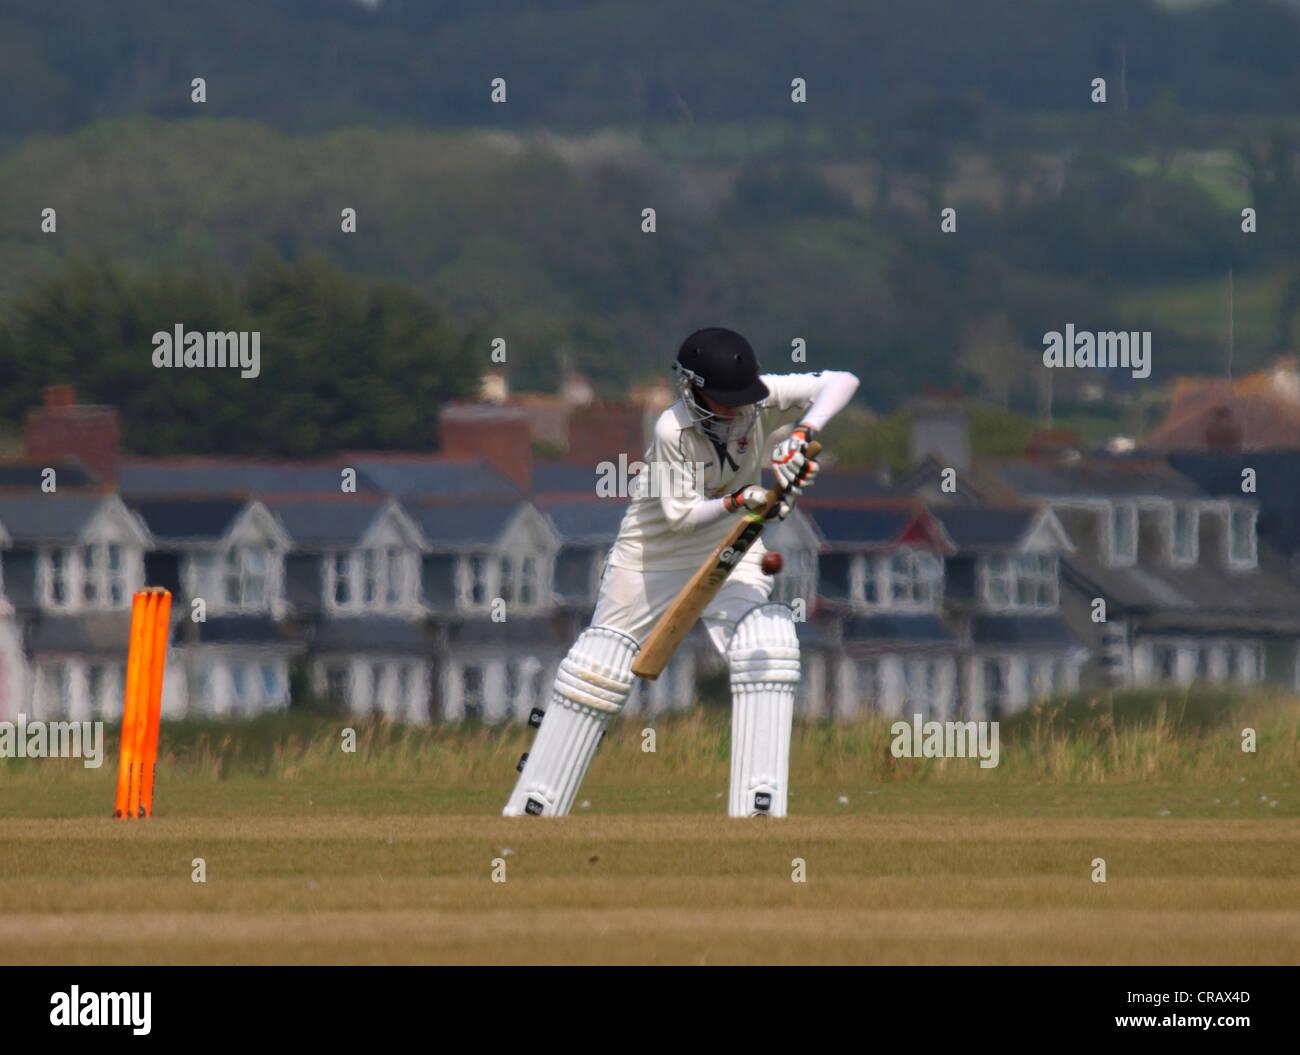 Junior batsman playing a defensive shot, Bude, Cornwall, UK - Stock Image